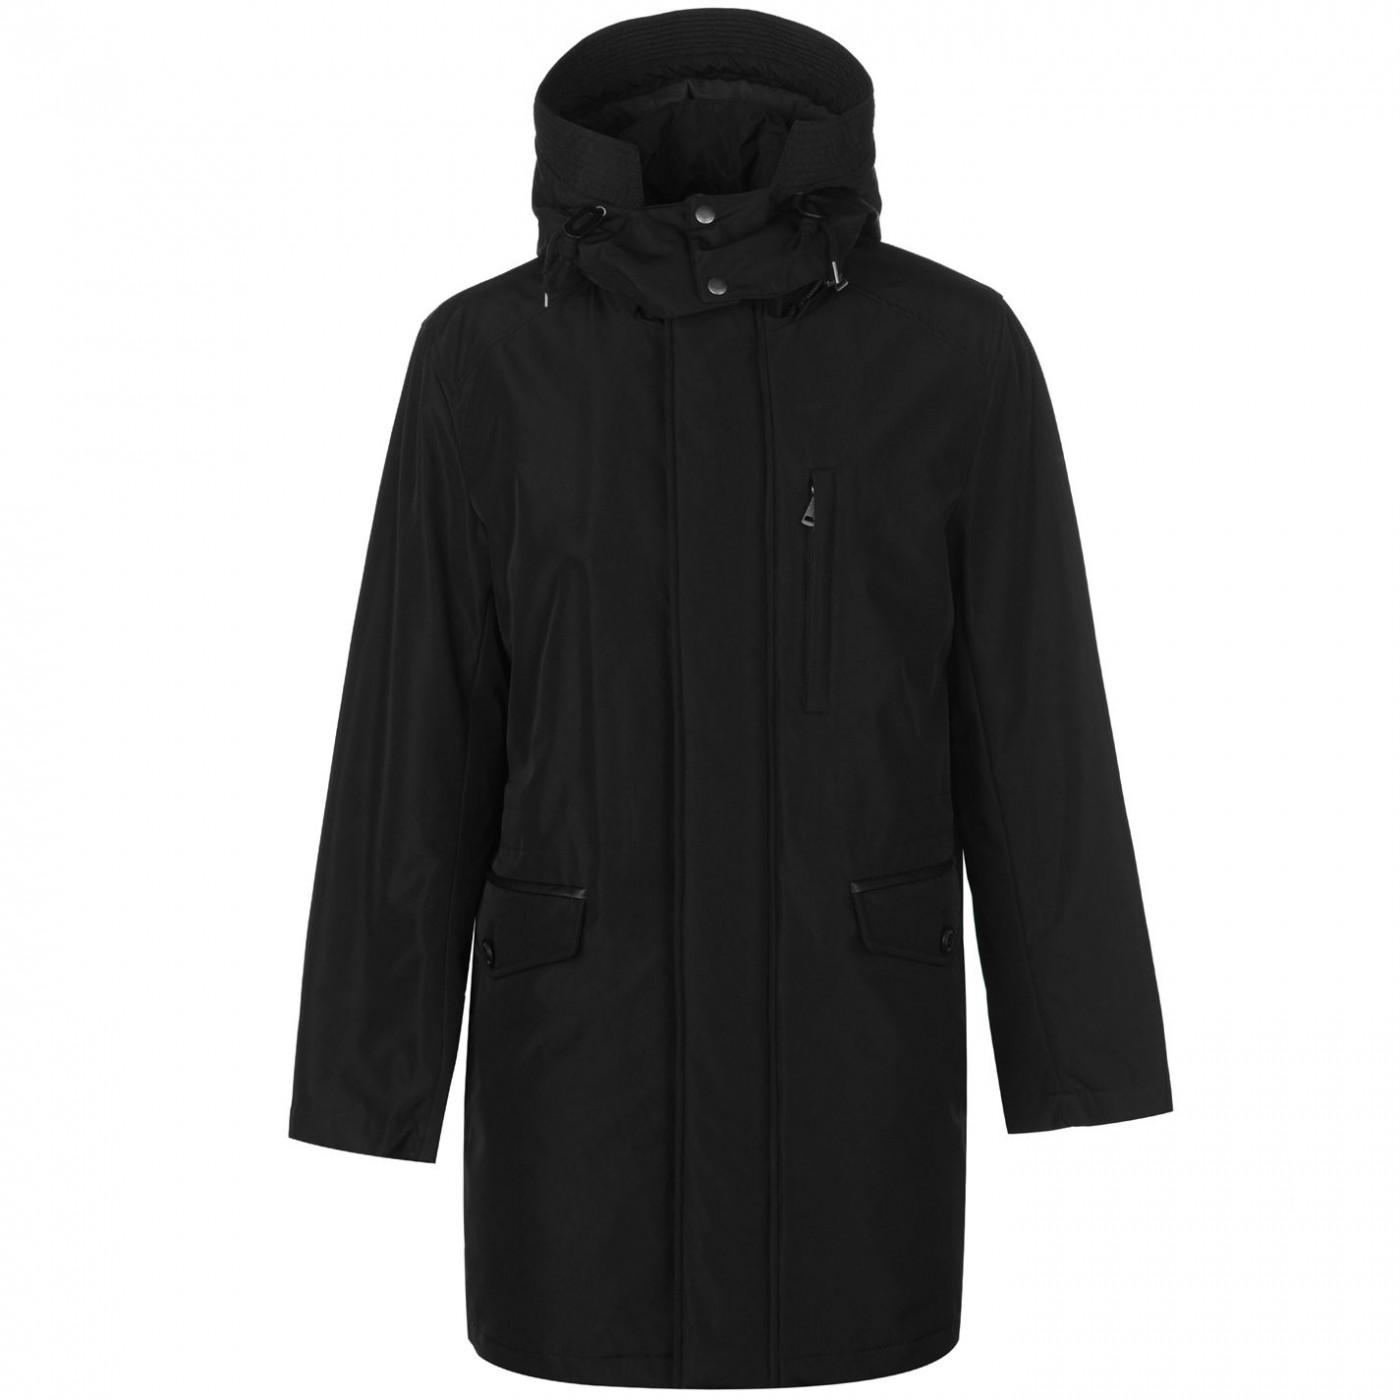 Cole Haan Nylon Parka Jacket Mens